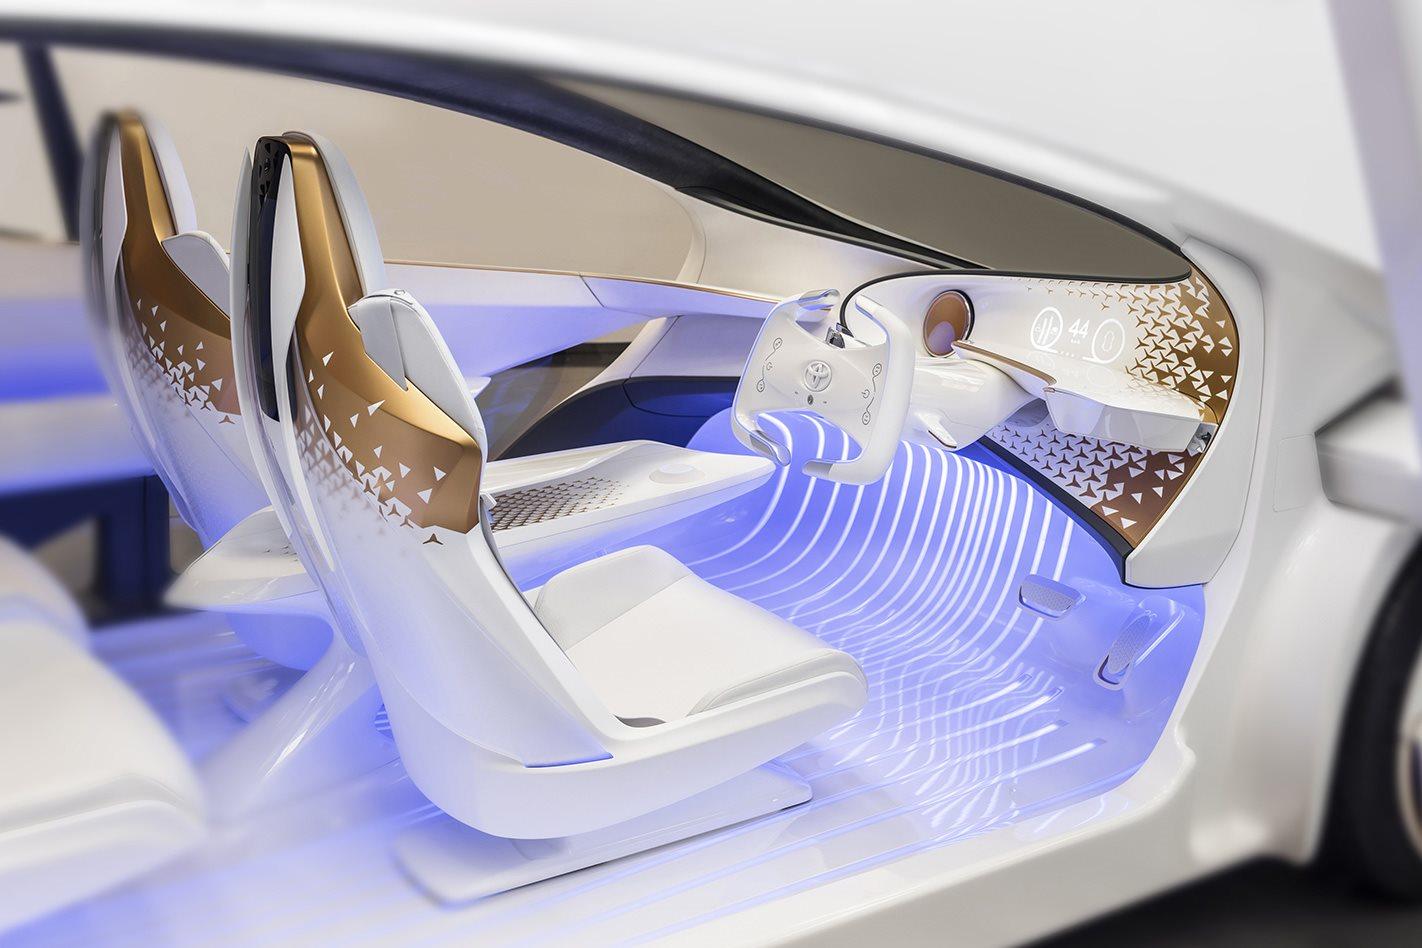 Driverless car model vehicle